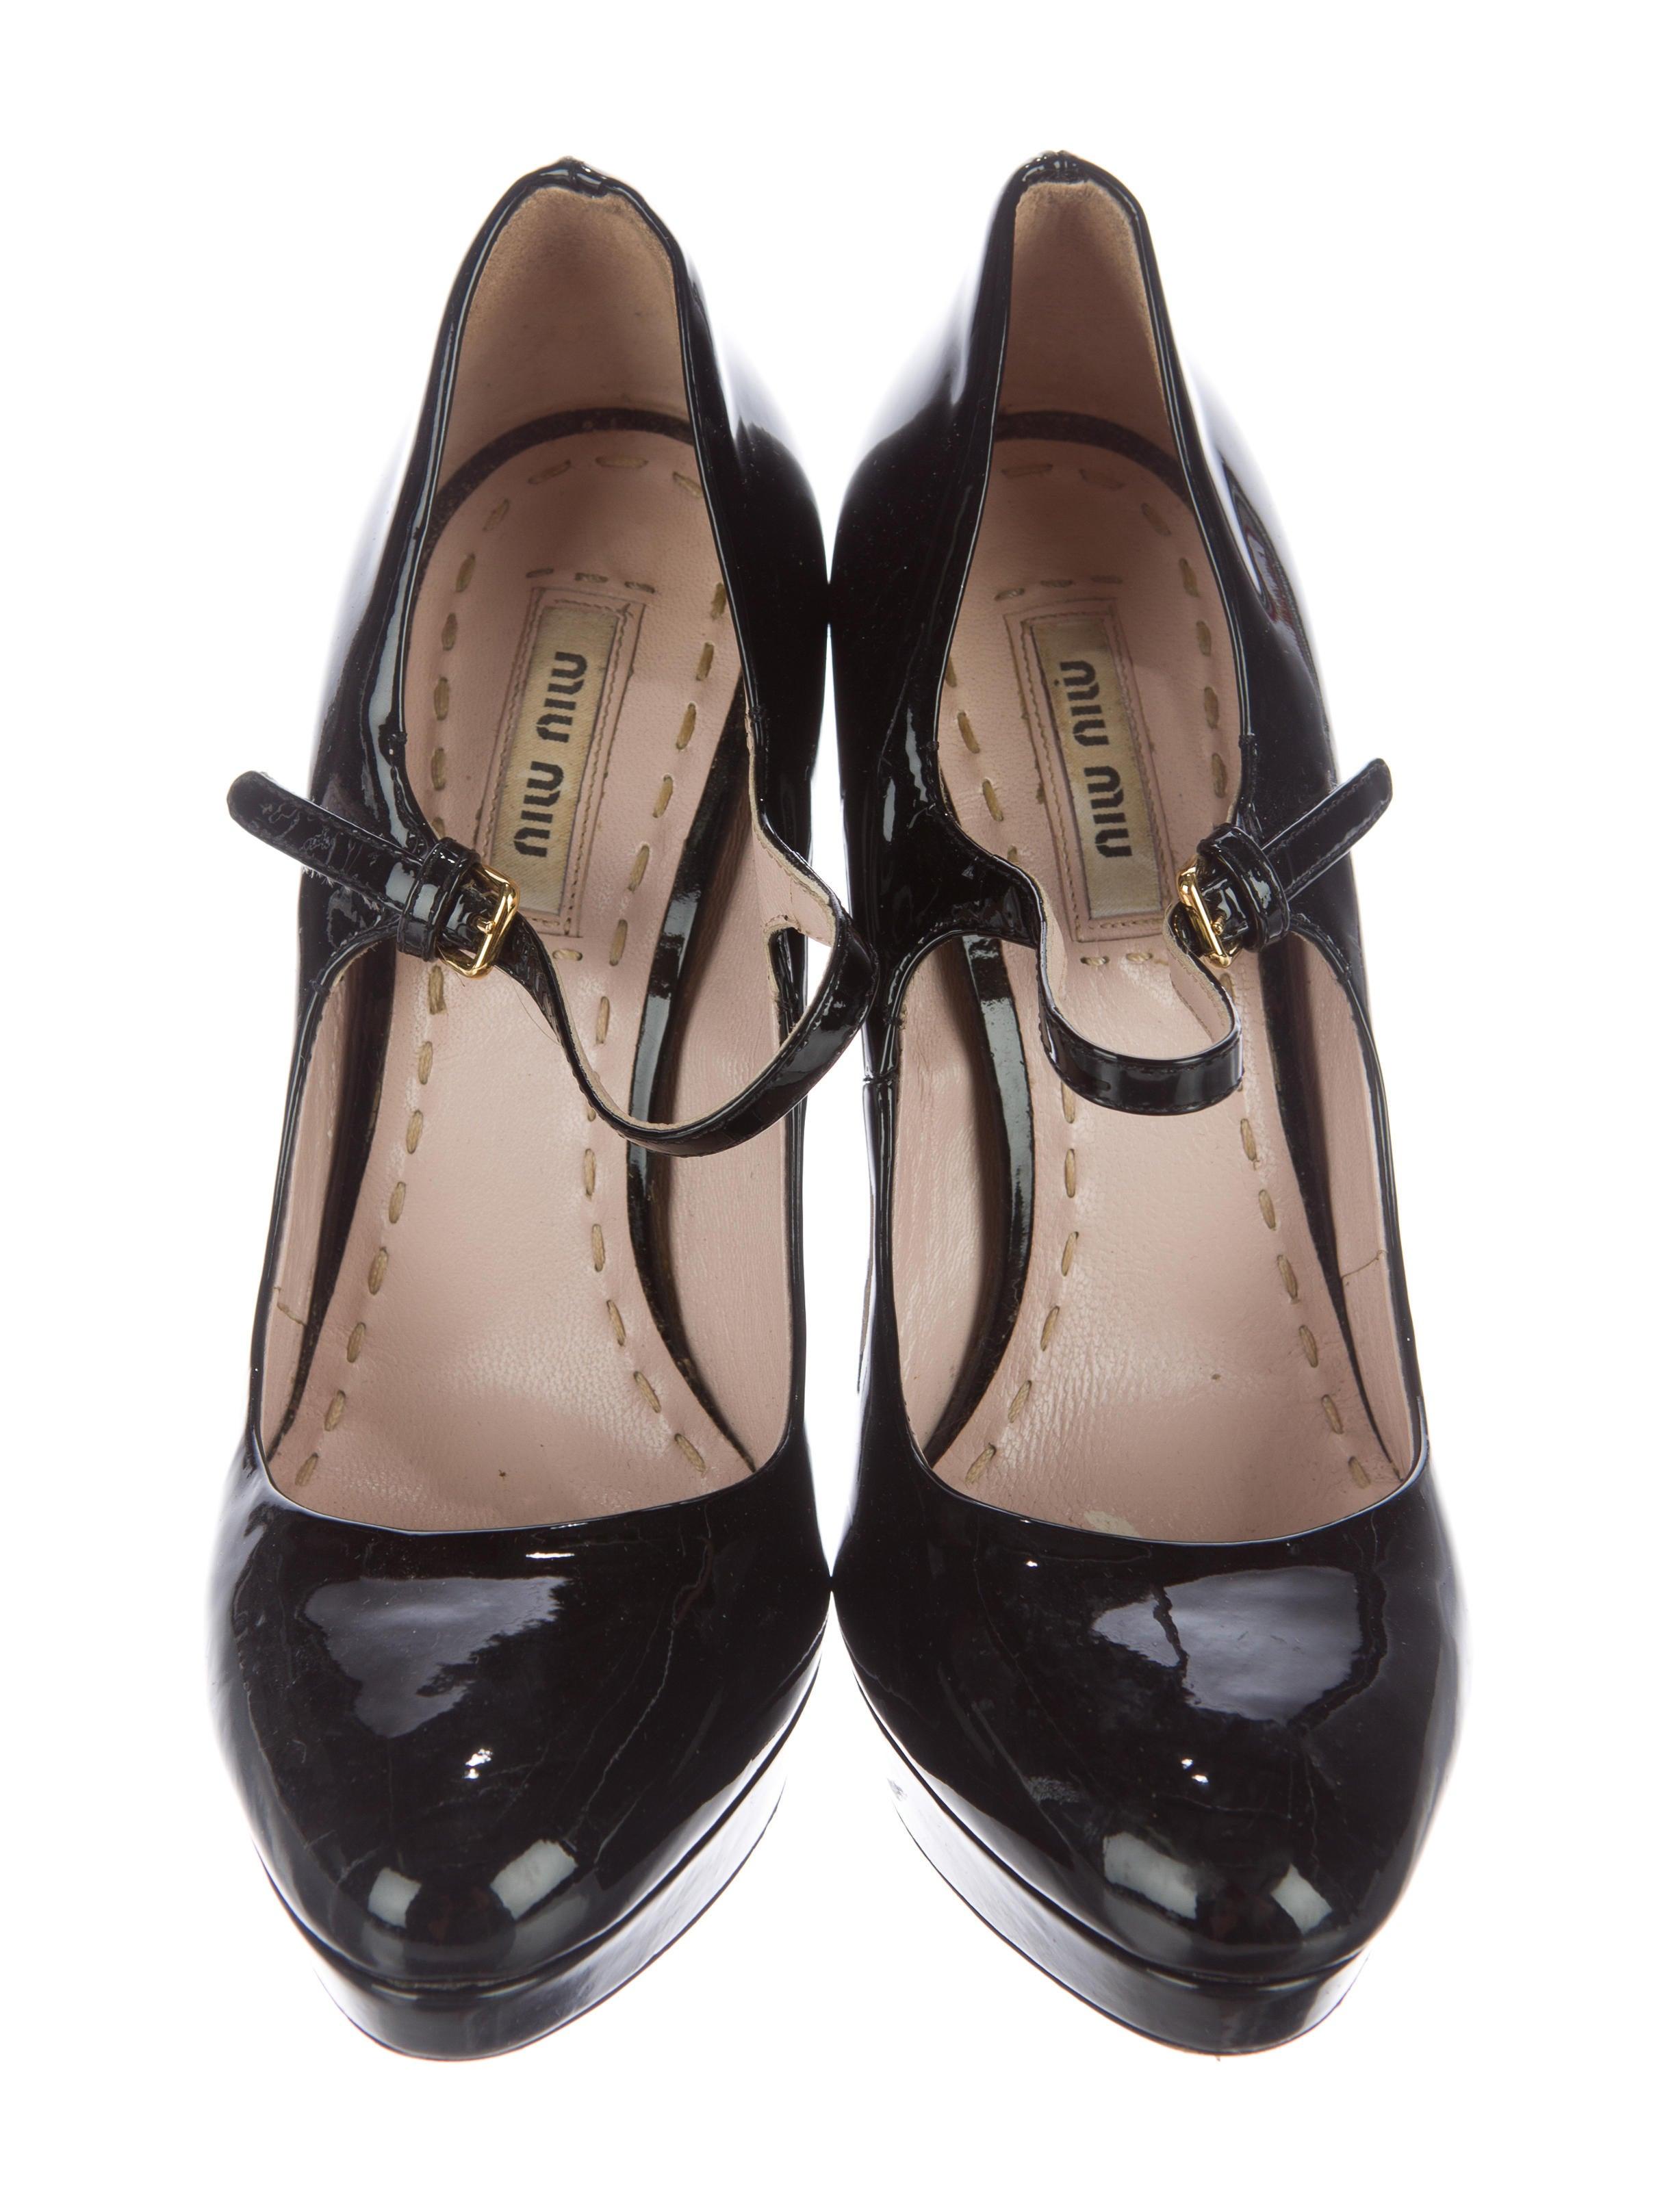 Miu Miu On Sale Shoes